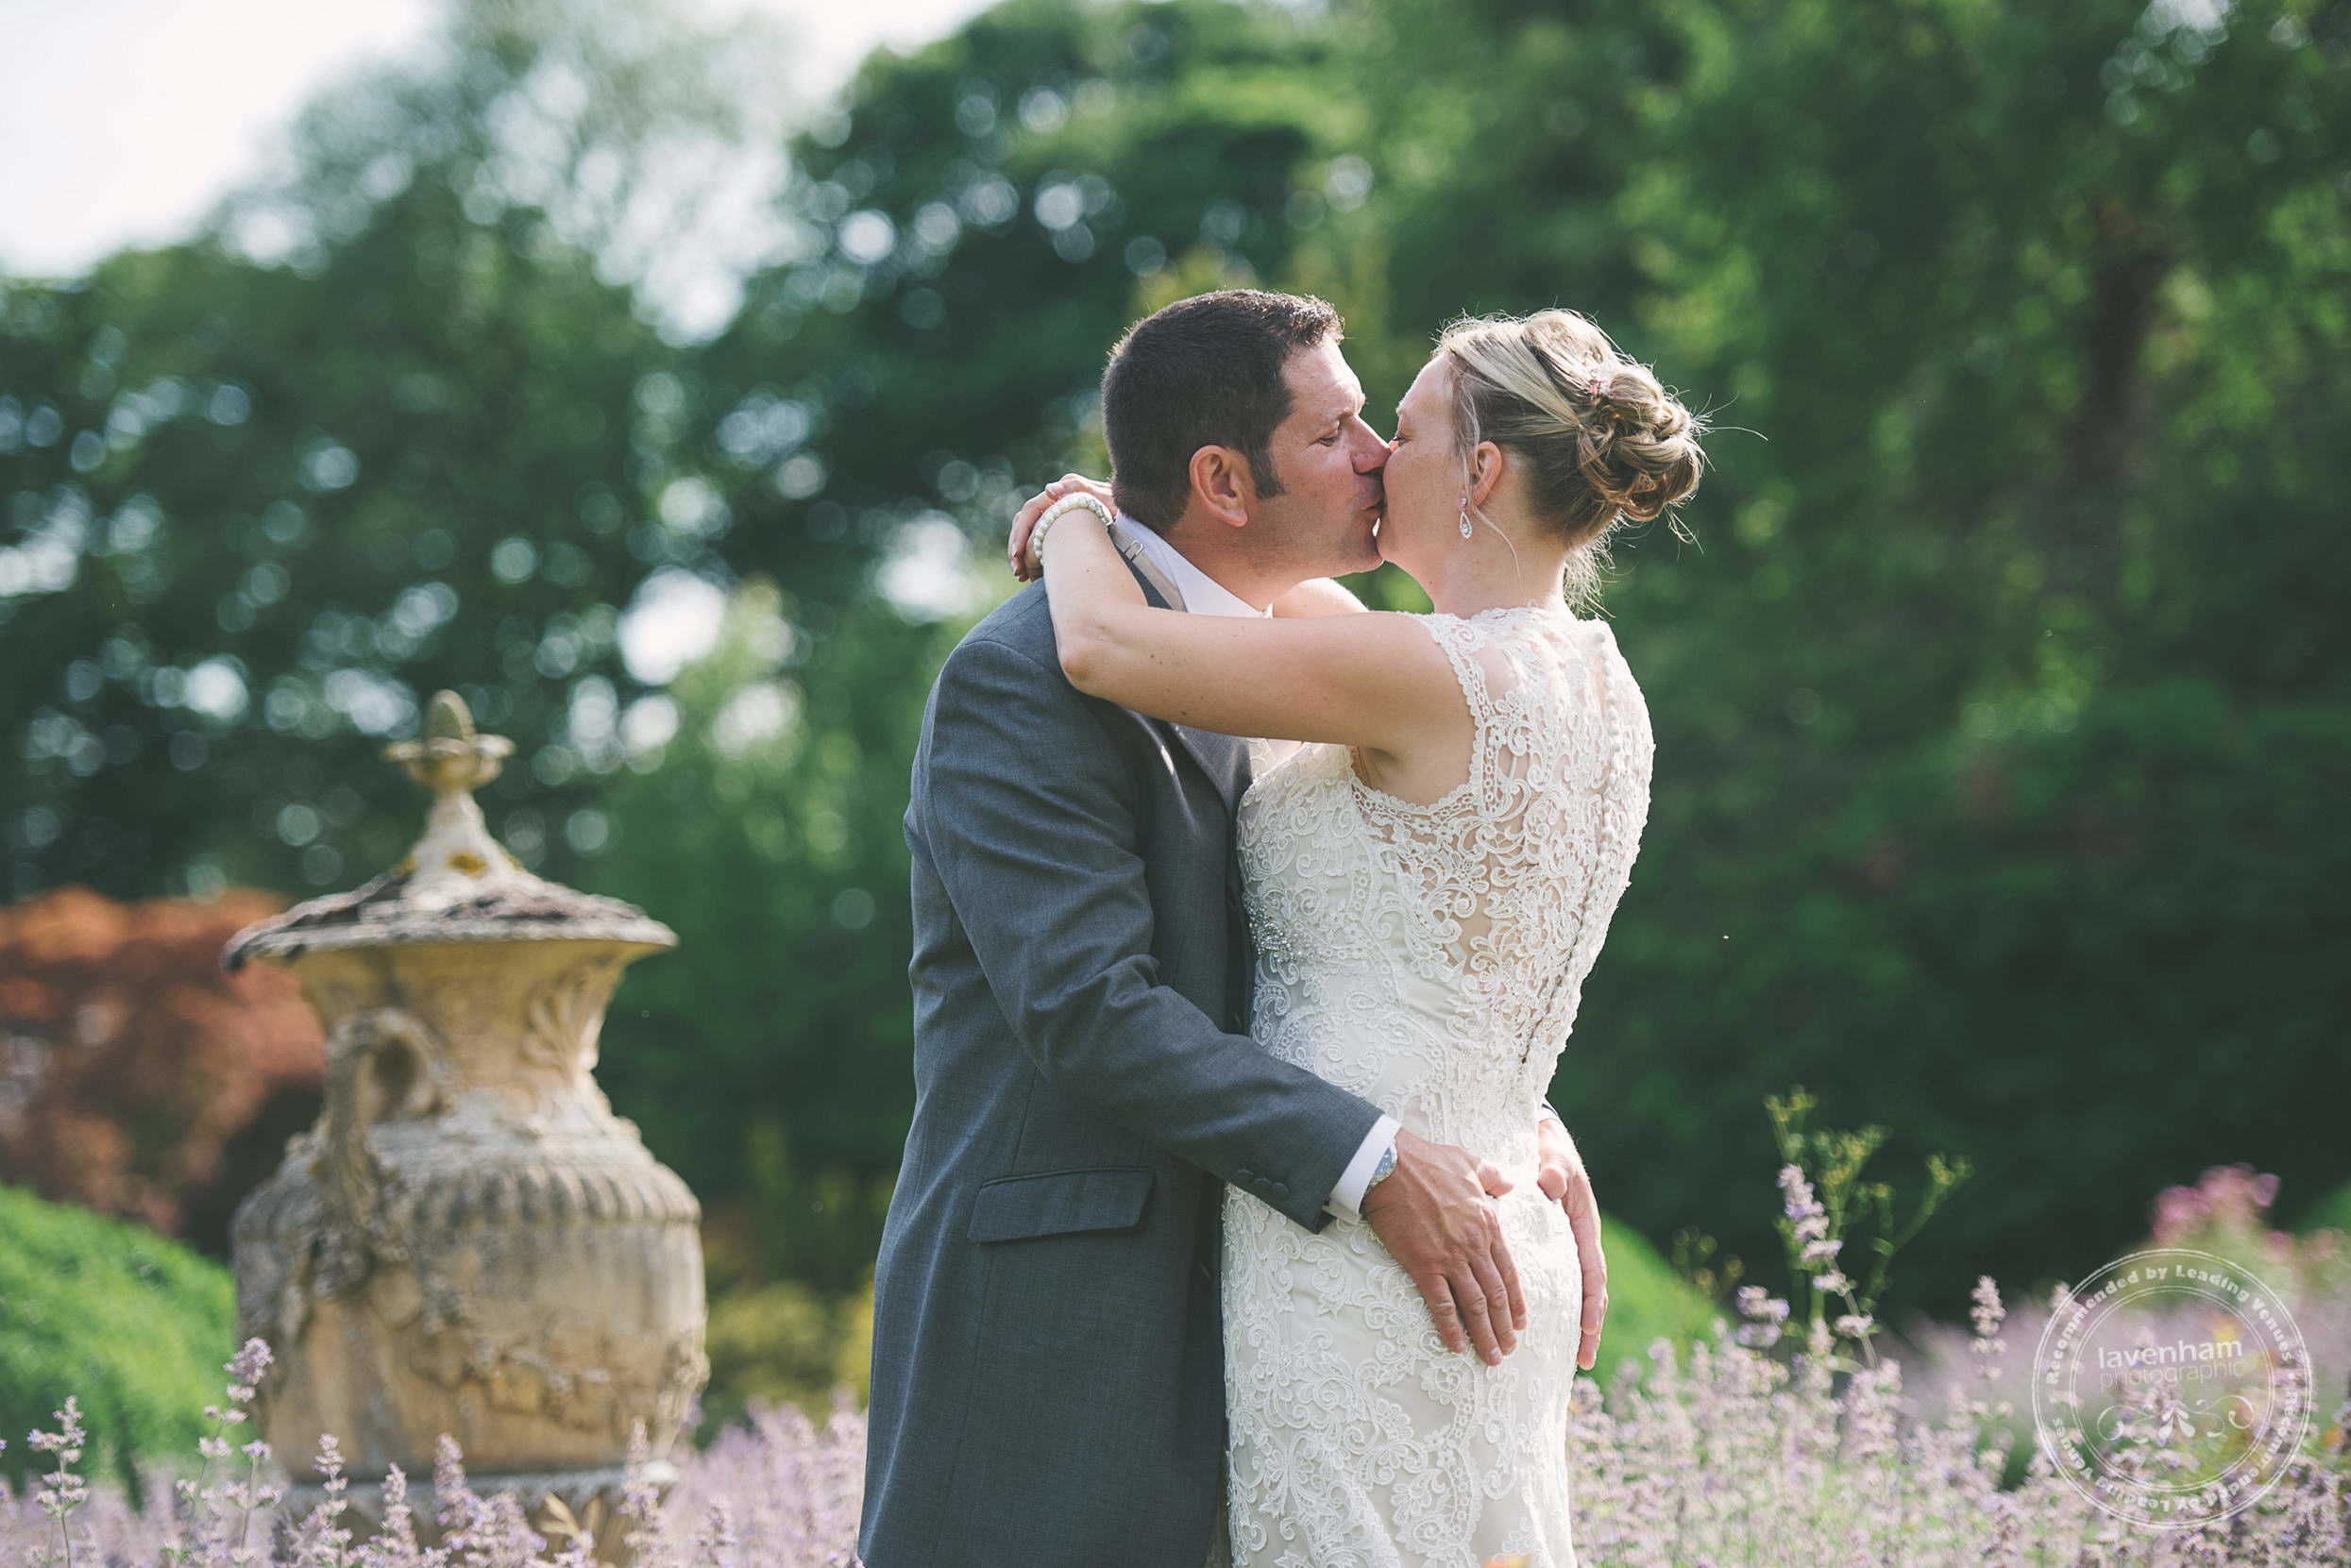 180715-kentwell-hall-wedding-photographer-031